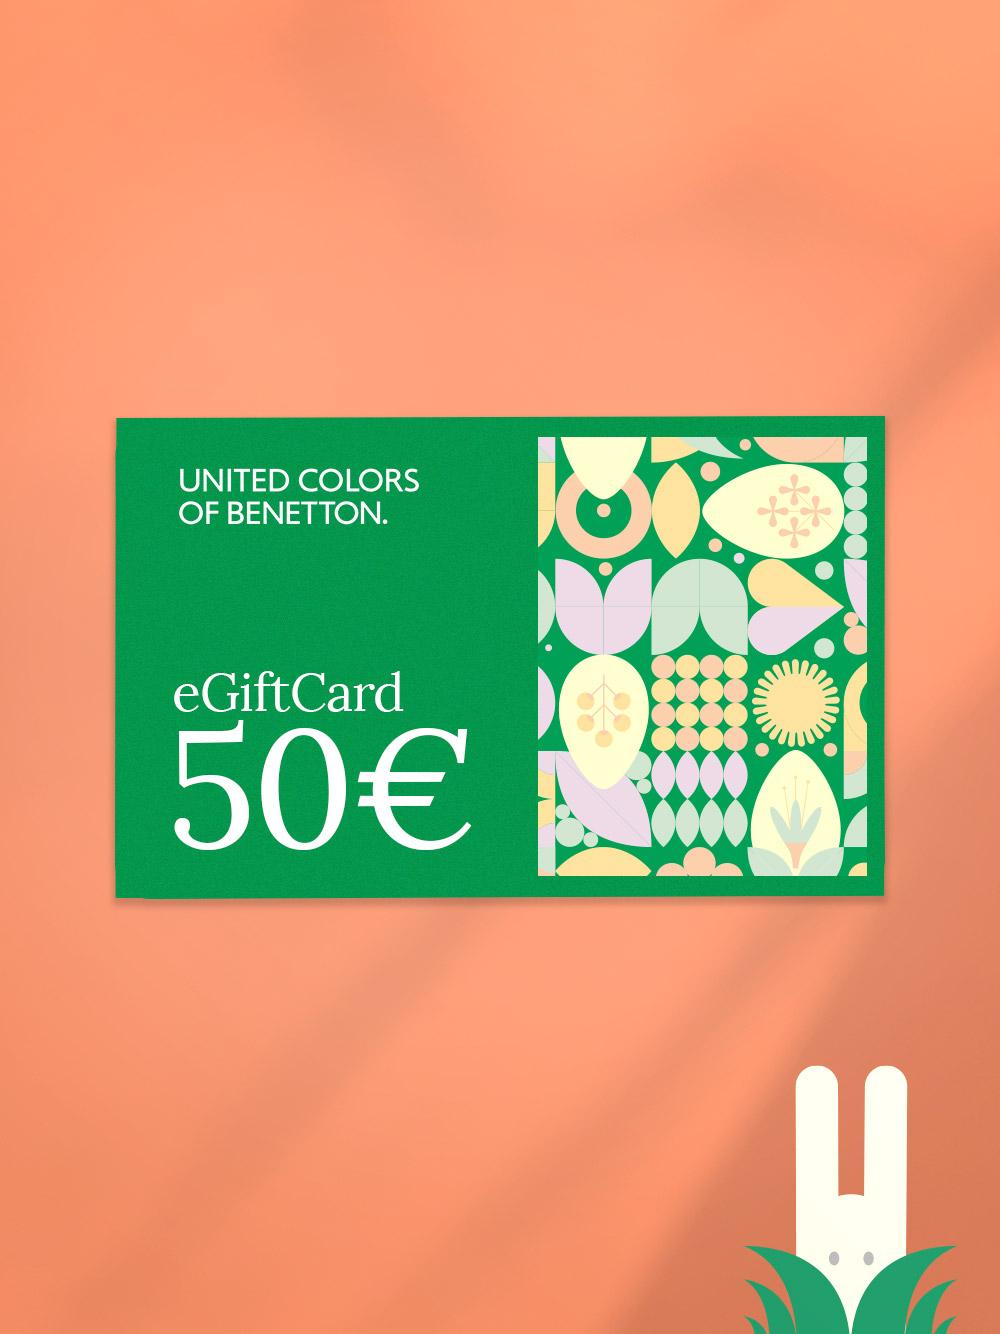 GIFT CARD GIFT CARD benetton 50 € GIFT CARD GIFT